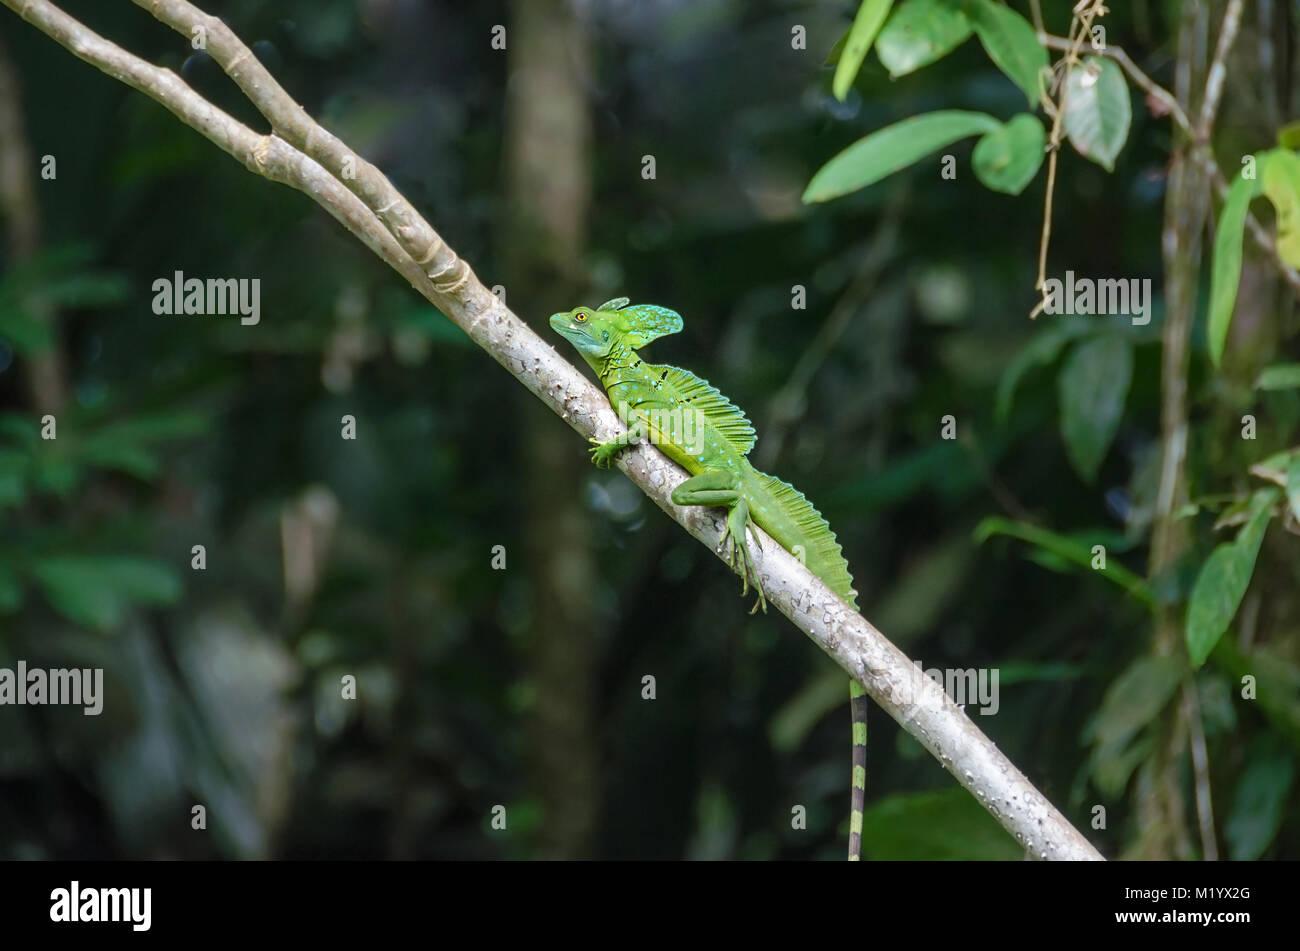 Male Plumed basilisk (Basiliscus plumifrons), also known as green basilisk, double crested basilisk, or Jesus Christ Stock Photo